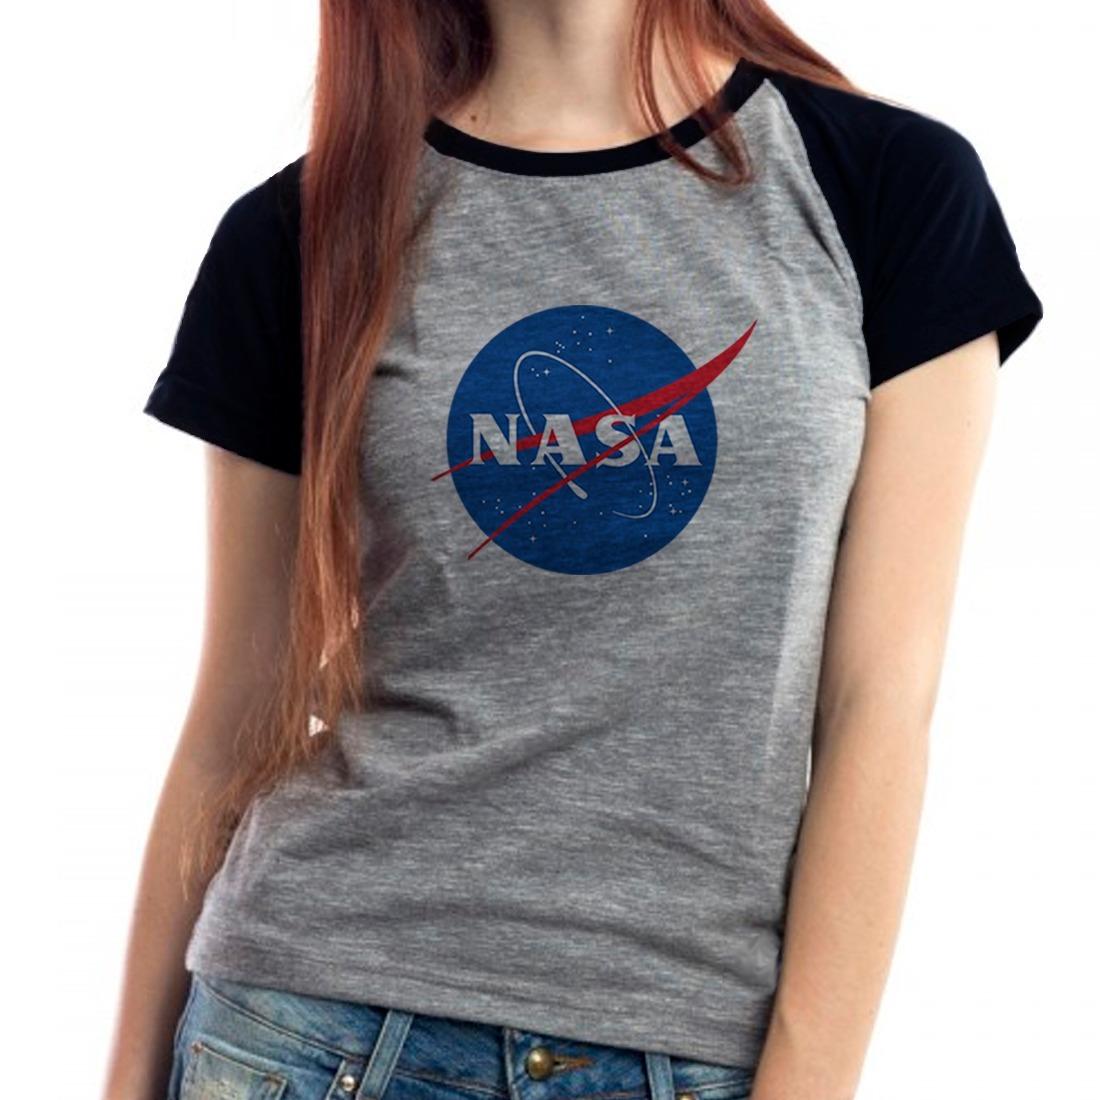 69cf14a6f camiseta nasa geek nerd cosplay raglan mescla babylook. Carregando zoom.